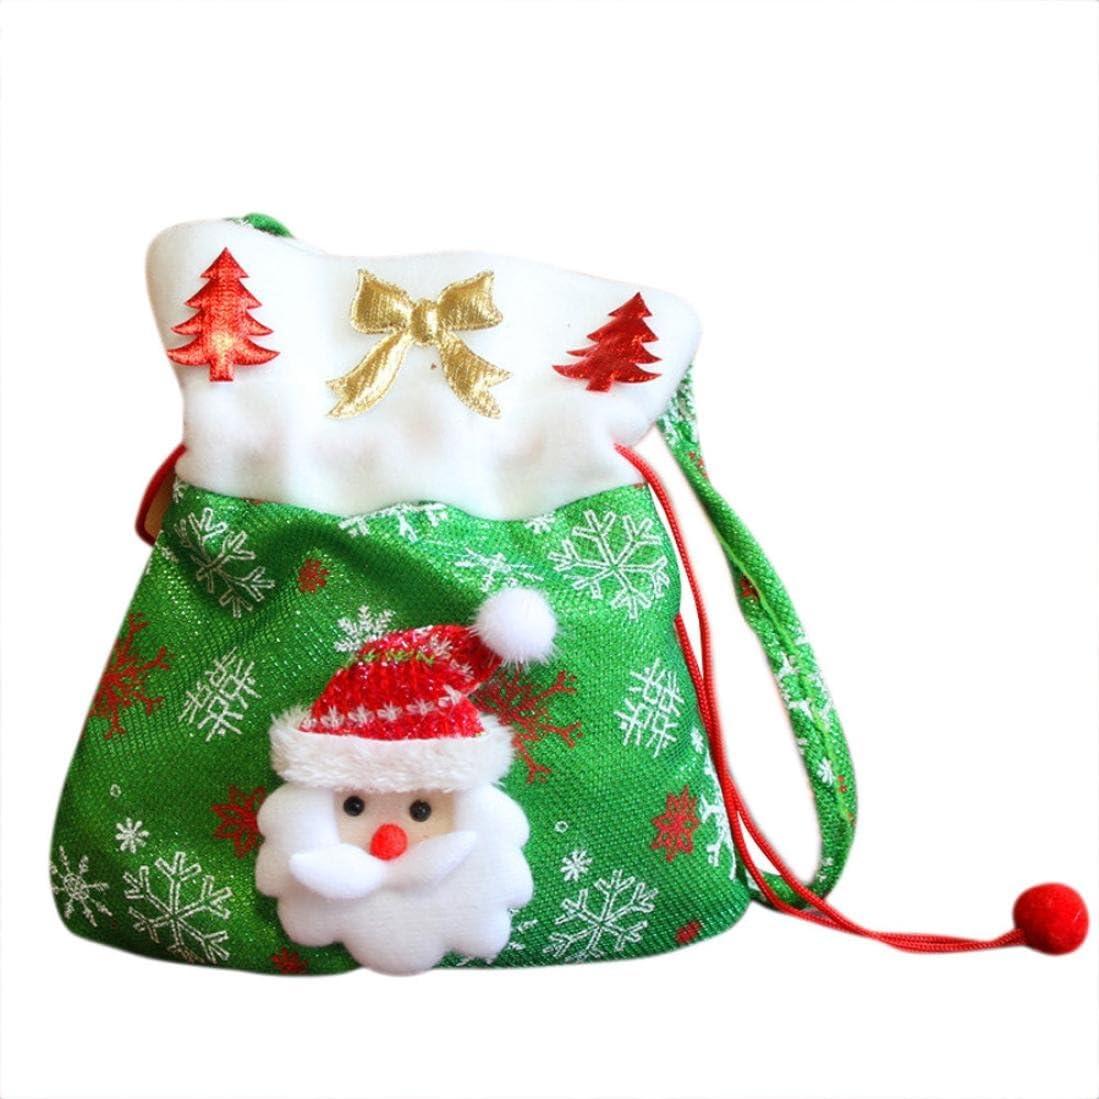 24cm Ouneed/® Noel Pochette Bonbon Cadeau 20 Vert